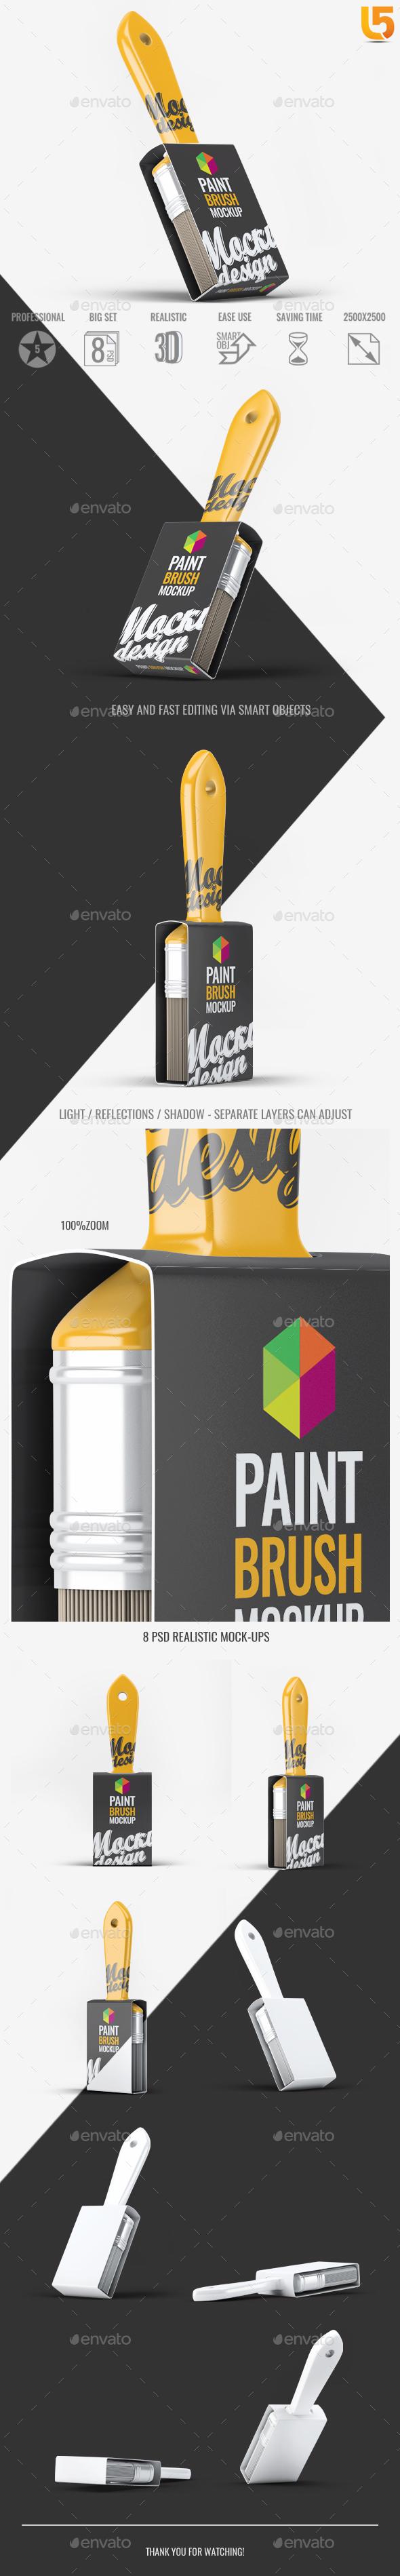 Paint Brush Mock-Up - Miscellaneous Print